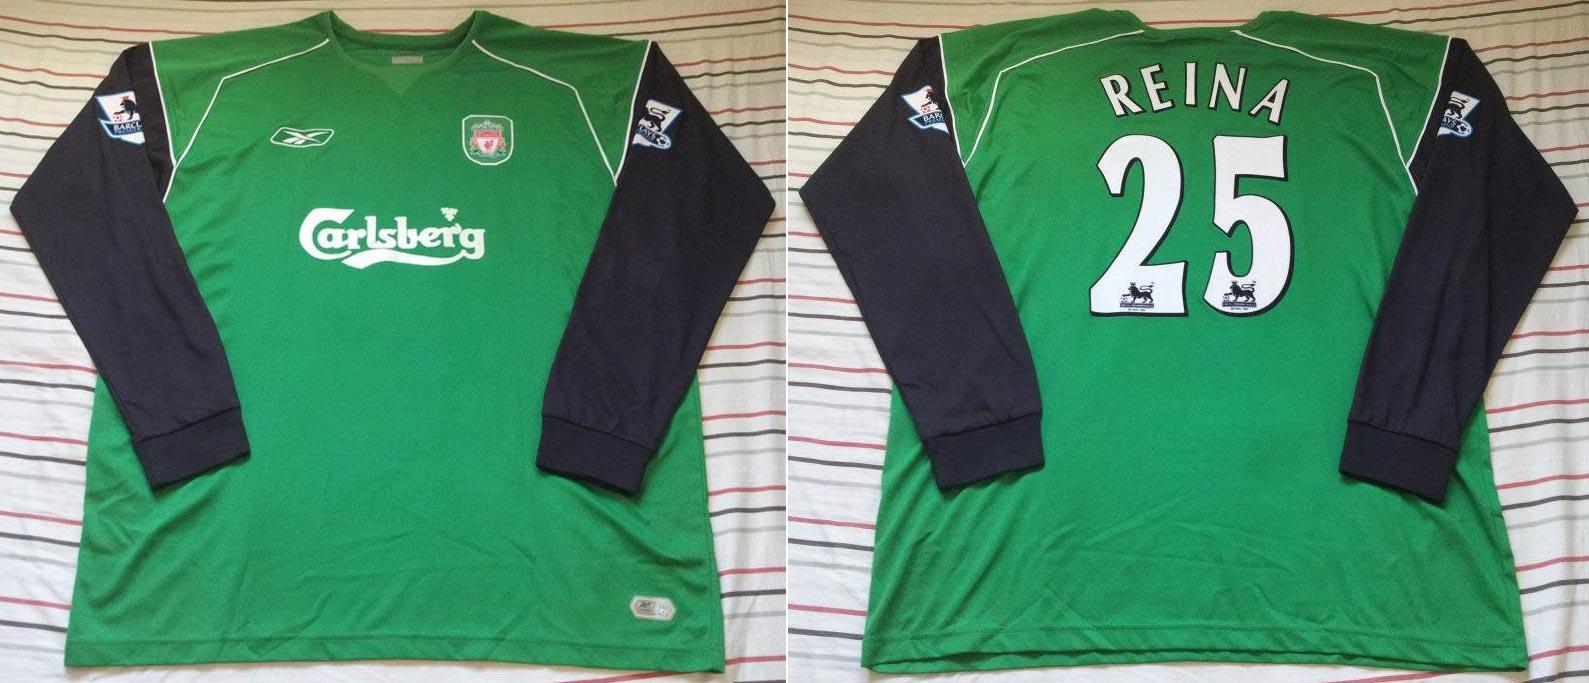 The History Liverpool F C Kits 2004 2005